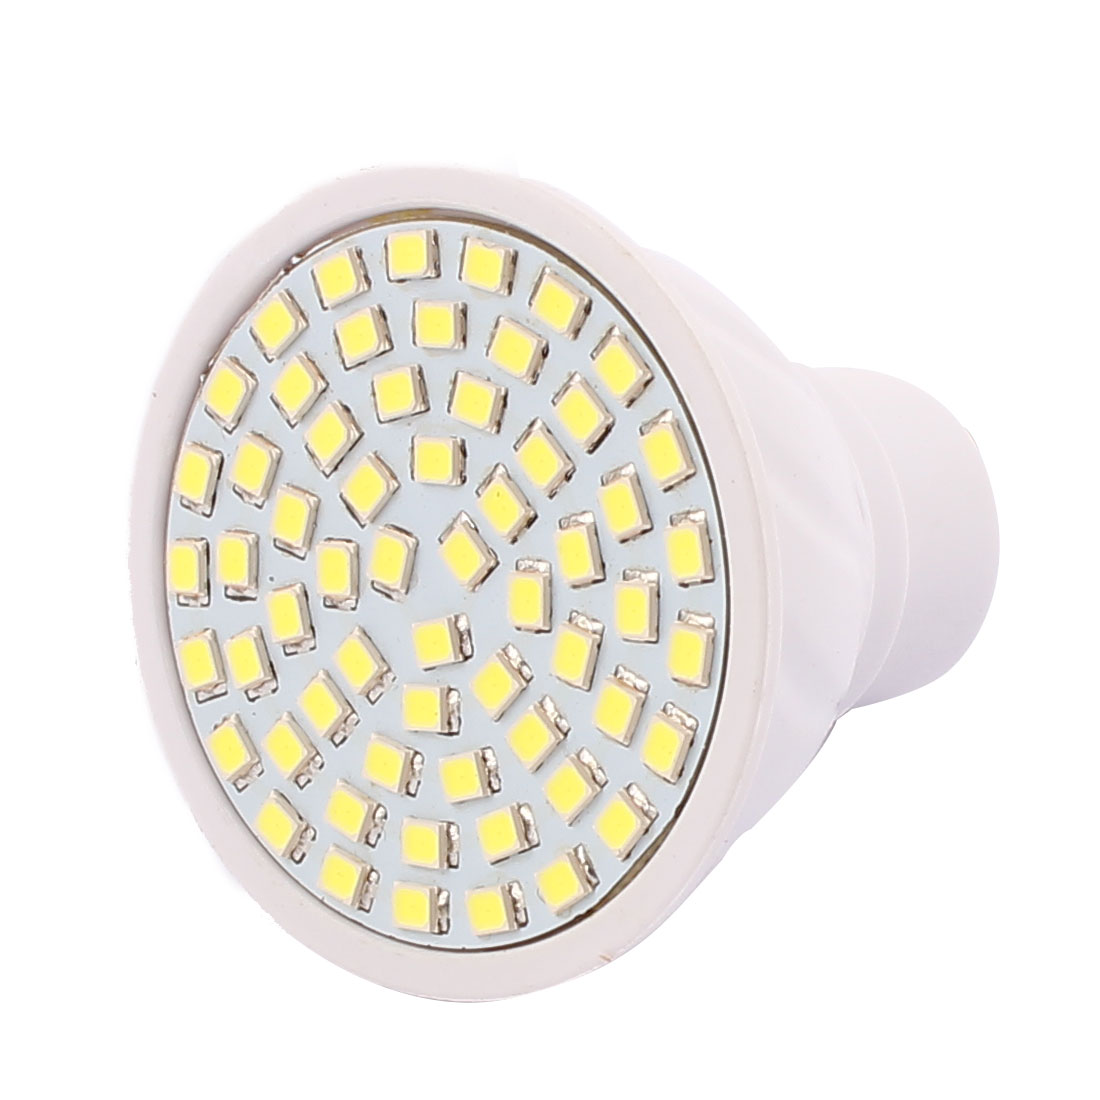 GU10 SMD 2835 60 LEDs AC 220V 6W Plastic Energy-Saving LED Lamp Bulb White